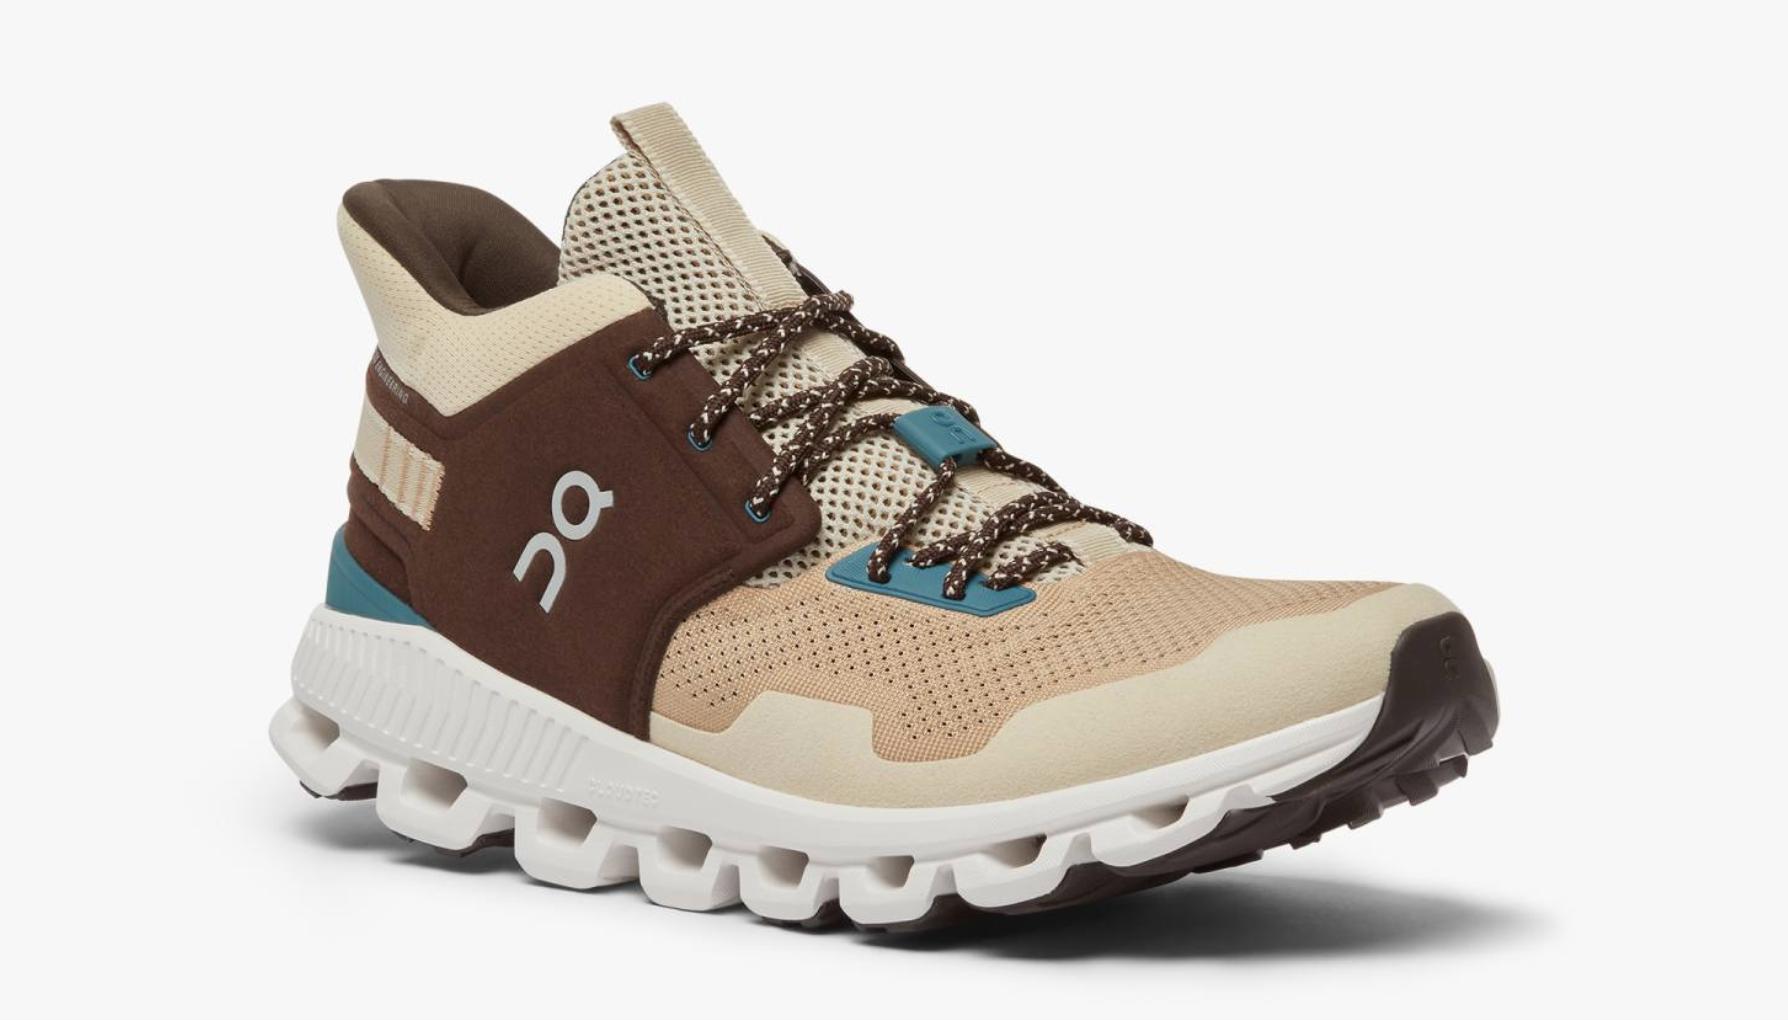 On Cloud Hi Edge | Sneaker Releases